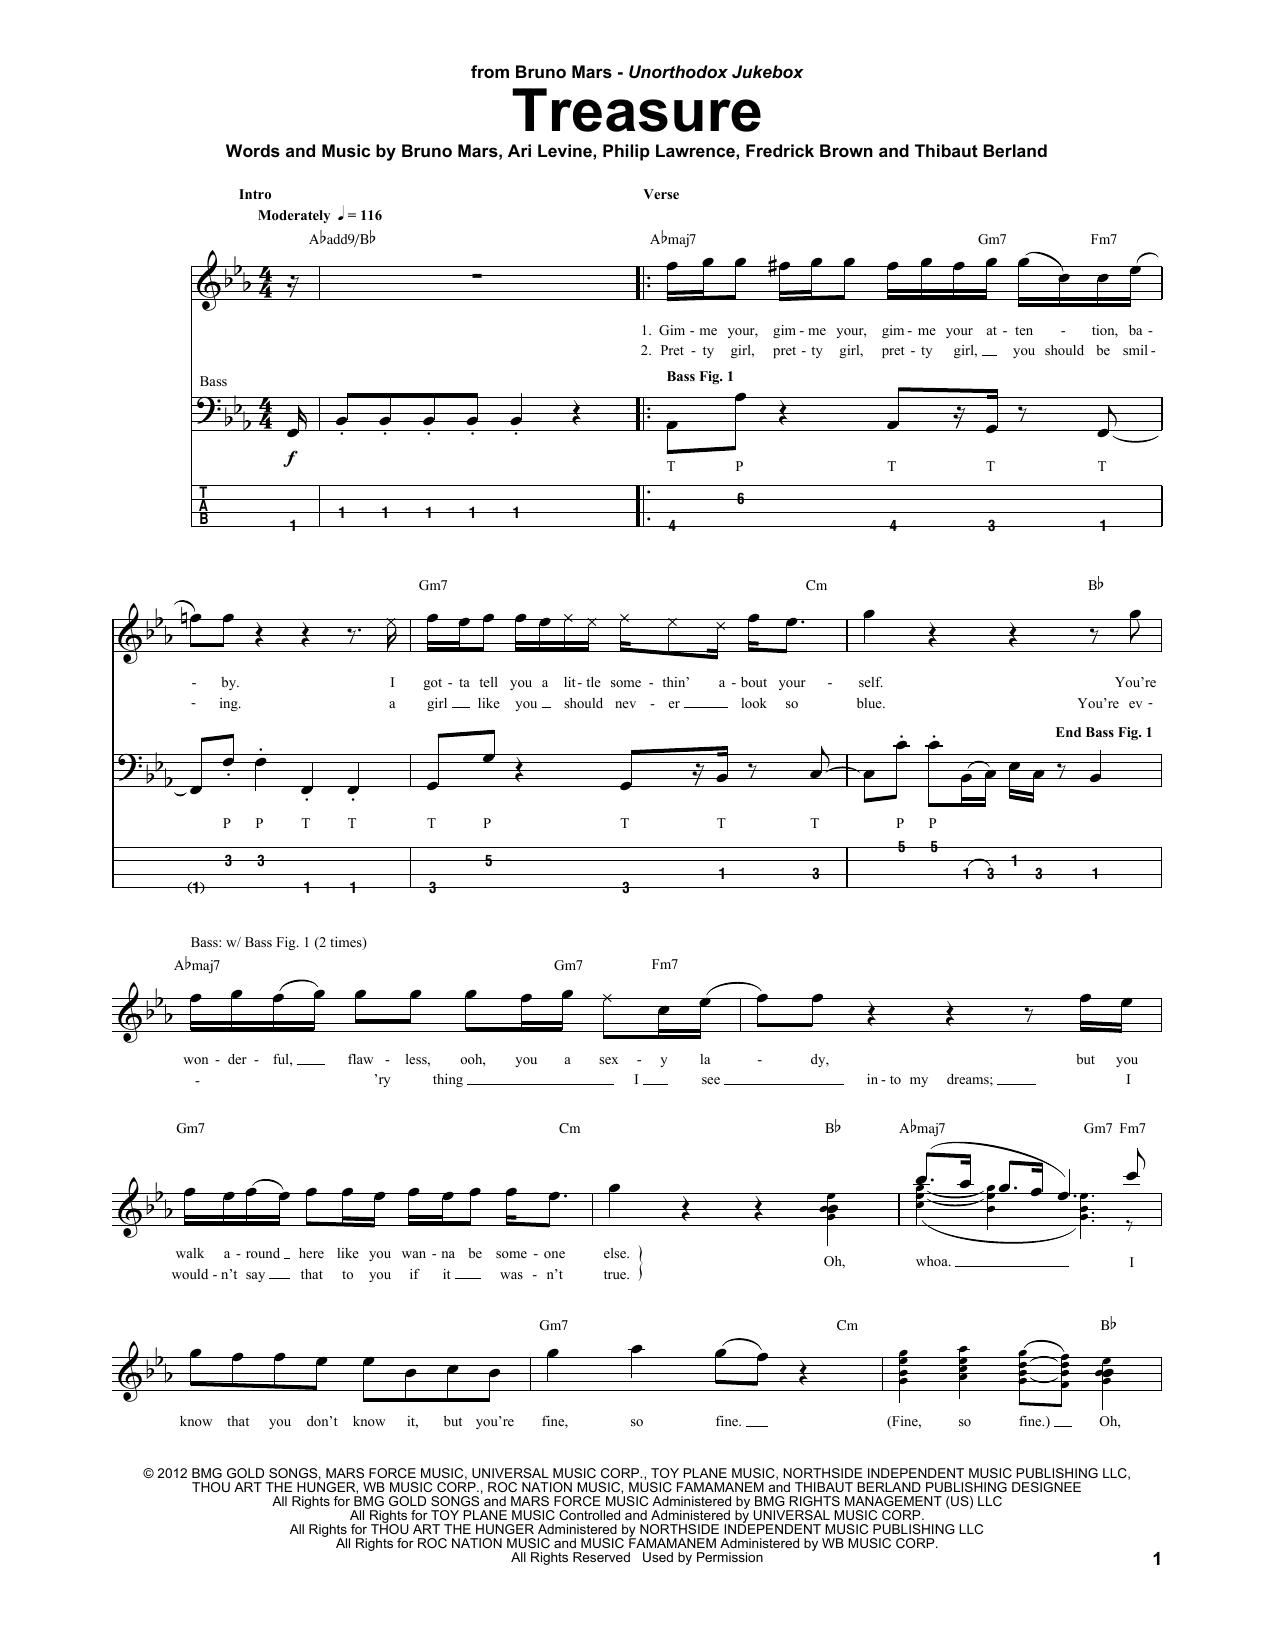 Tablature guitare Treasure de Bruno Mars - Tablature Basse